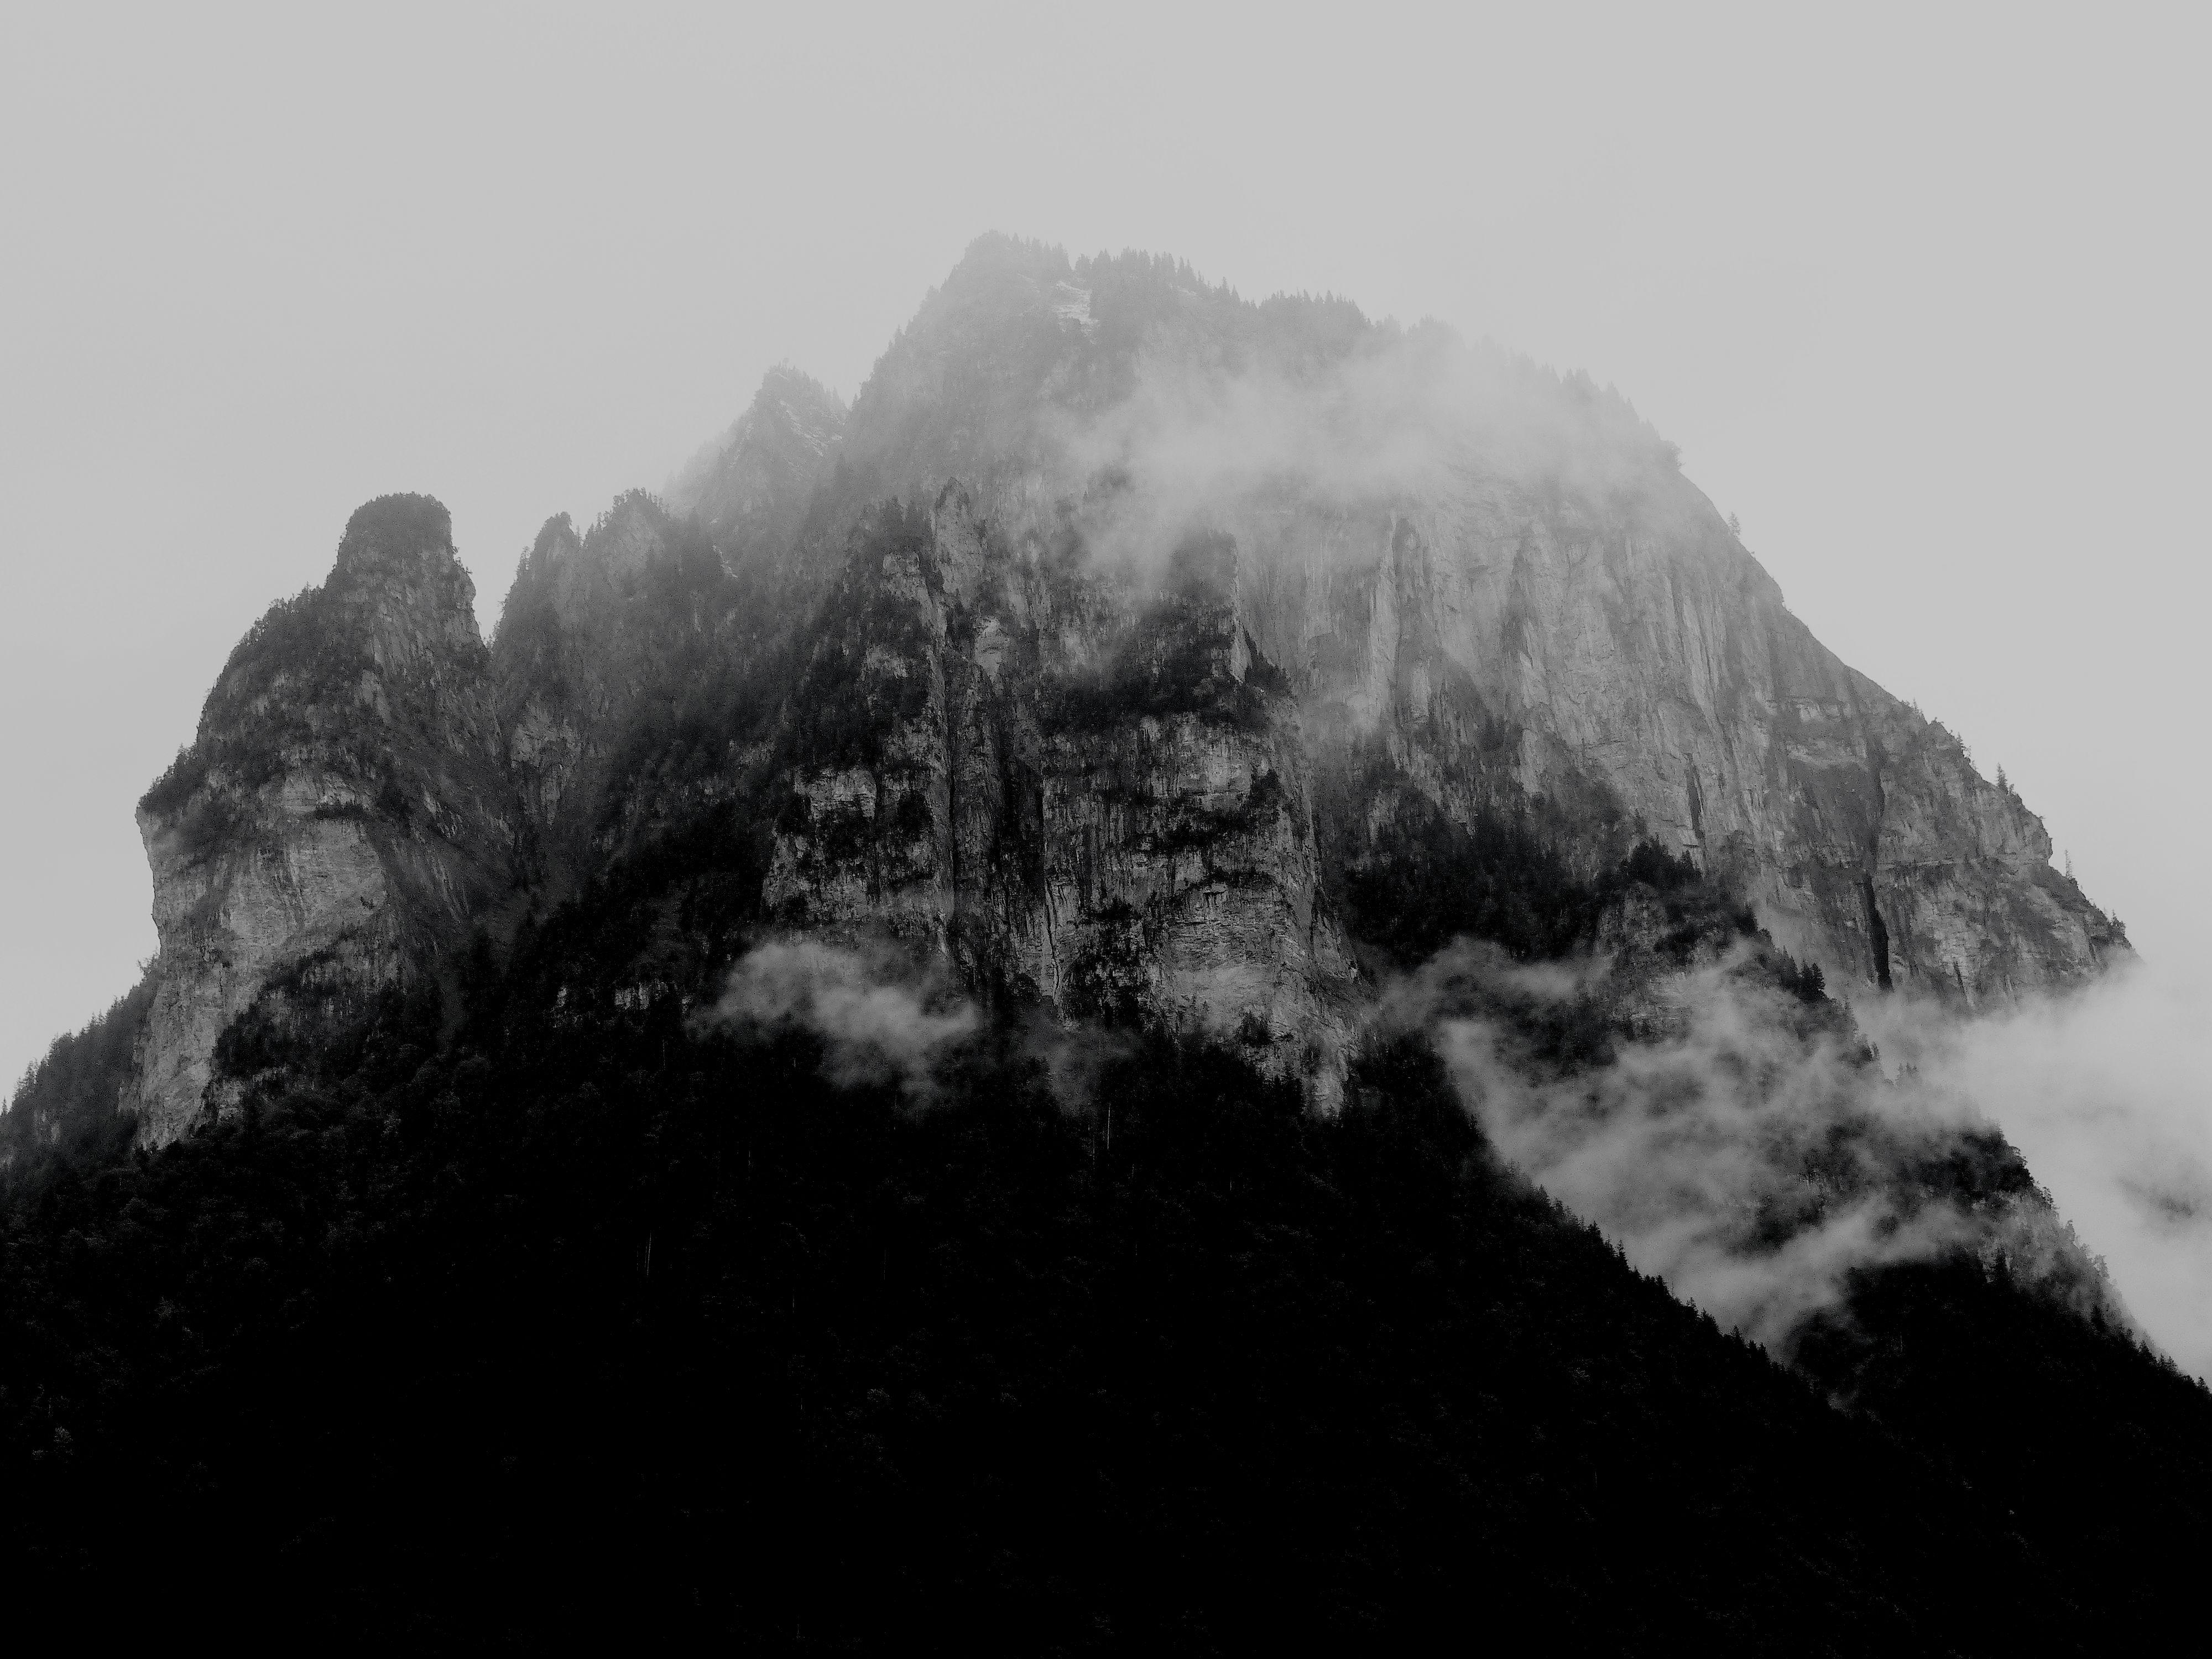 Switzerland - Beginner Photography Course